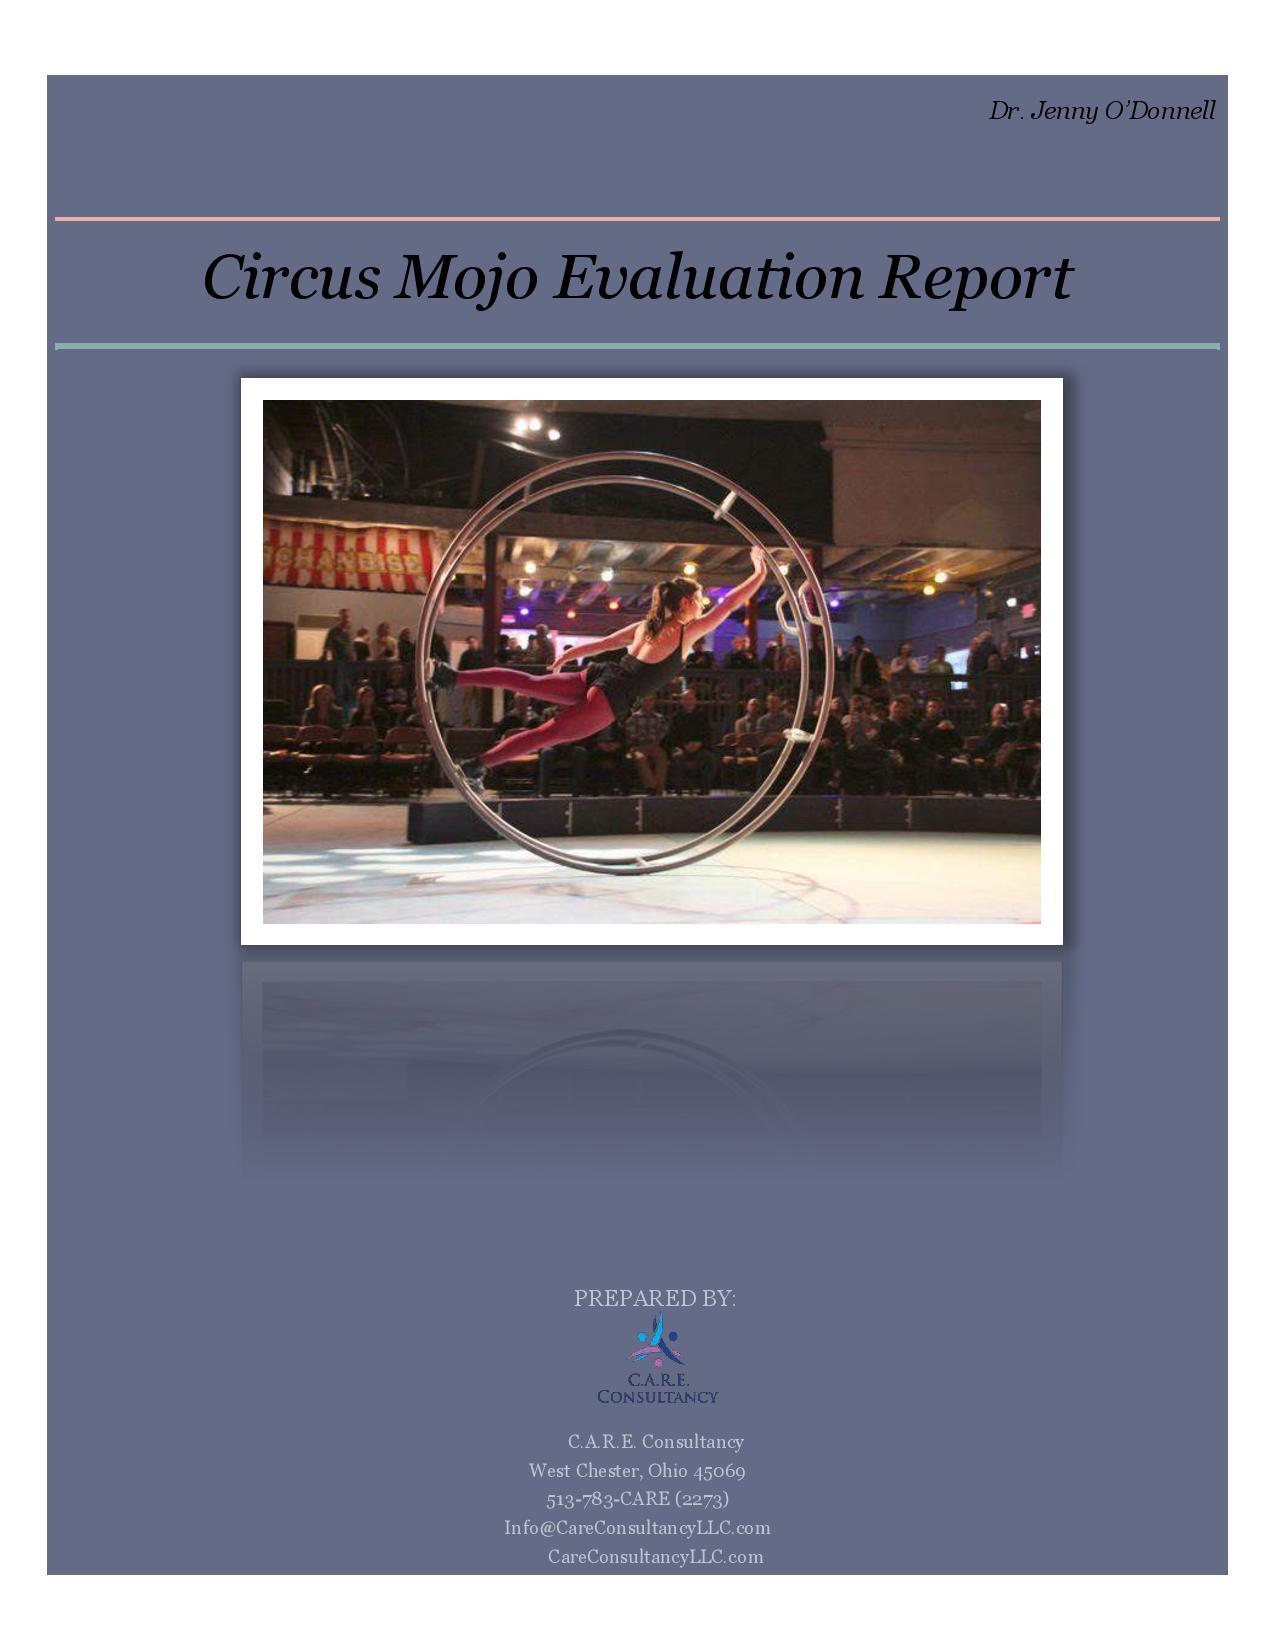 Circus Mojo Program Evaluation CARE.compressed page 001 1